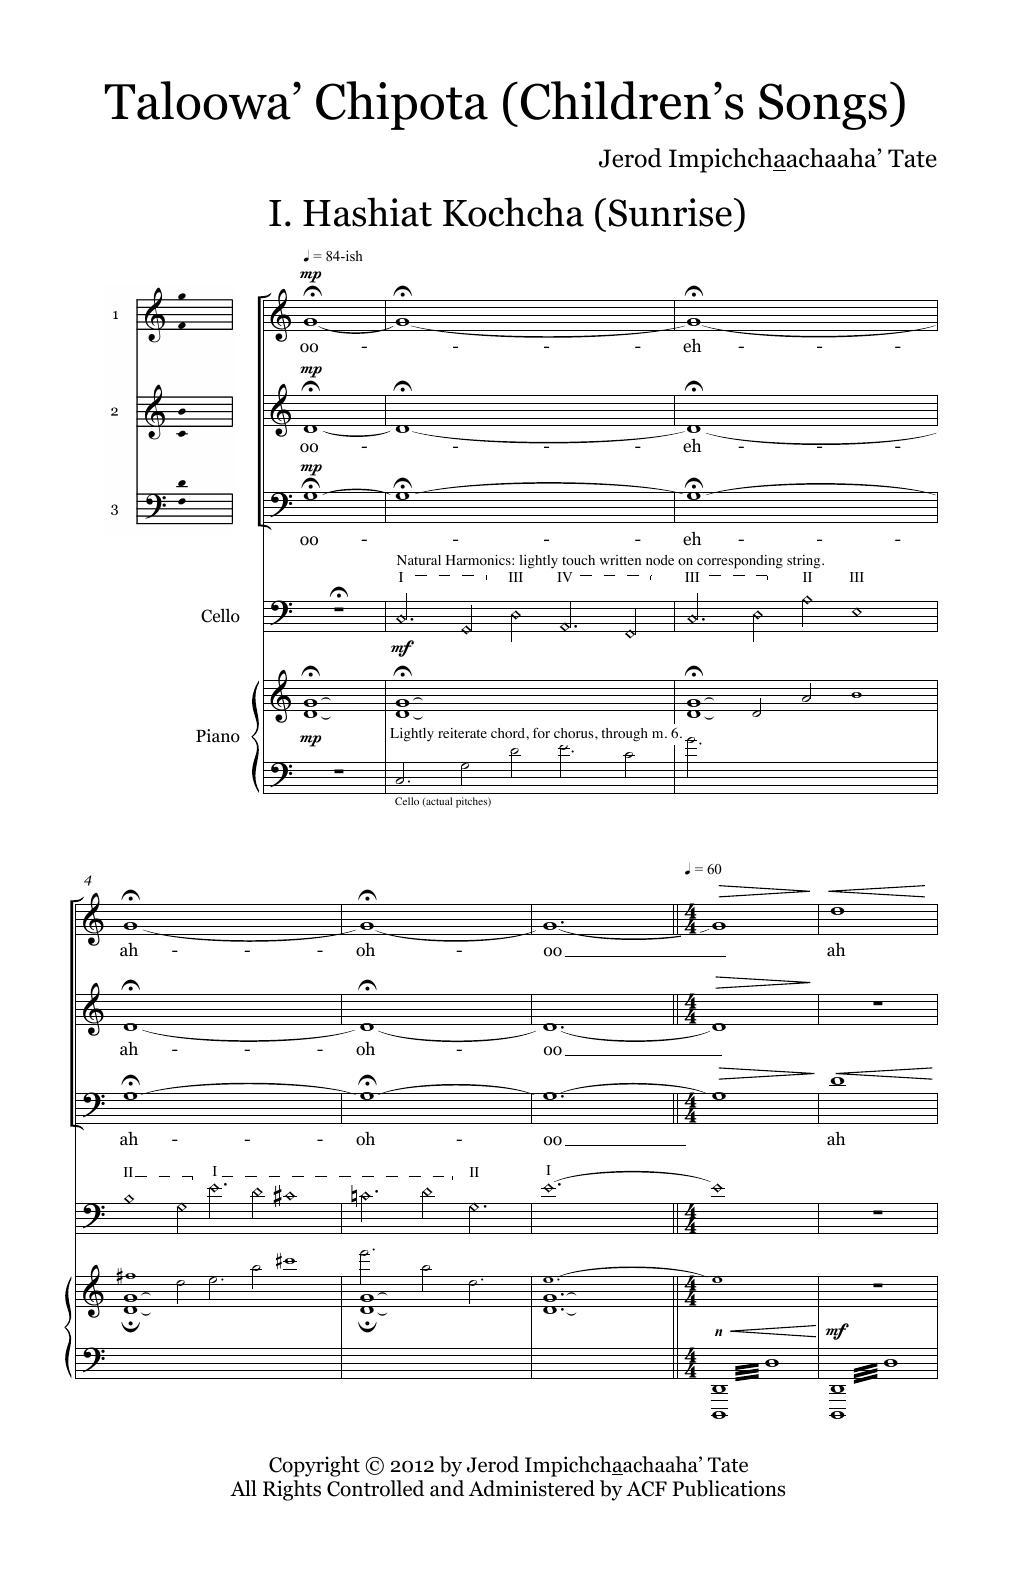 Taloowa' Chipota (Children's Songs) Sheet Music